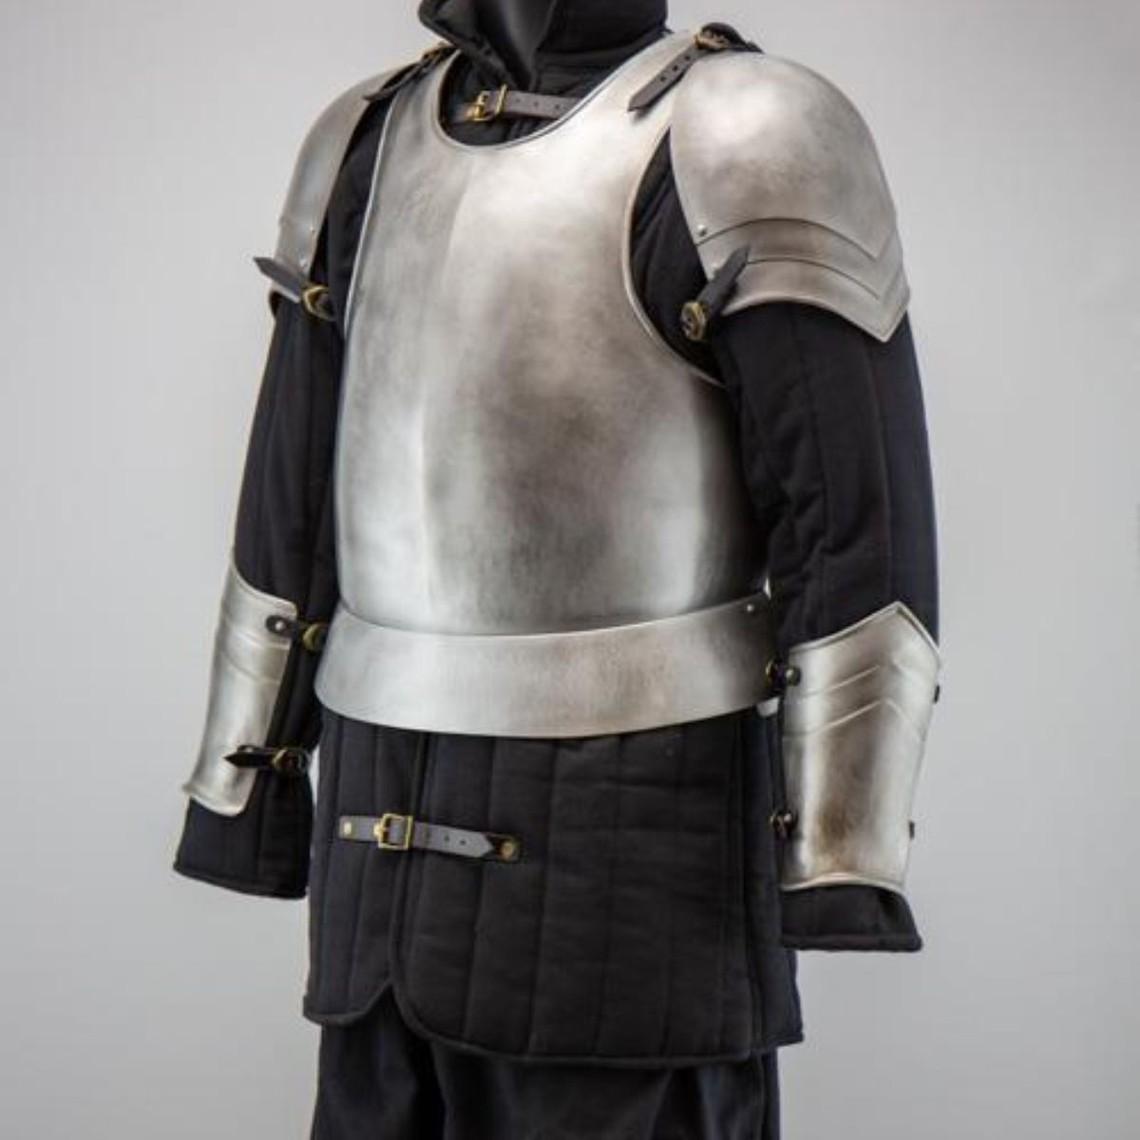 Epic Armoury GRV corazza medievale Mercenario